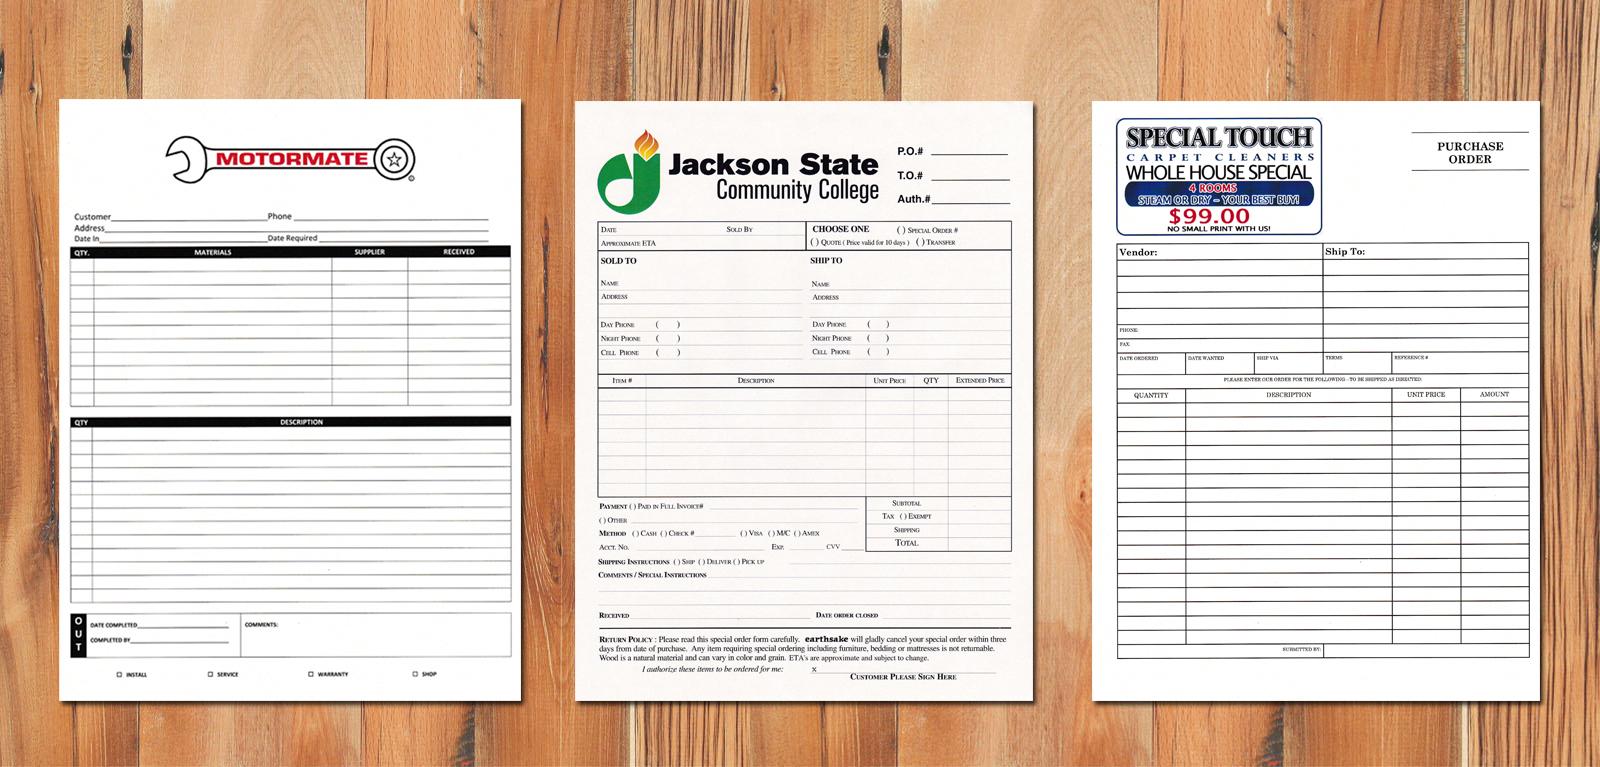 Part Forms Cabonlesscom - Custom carbonless invoice forms